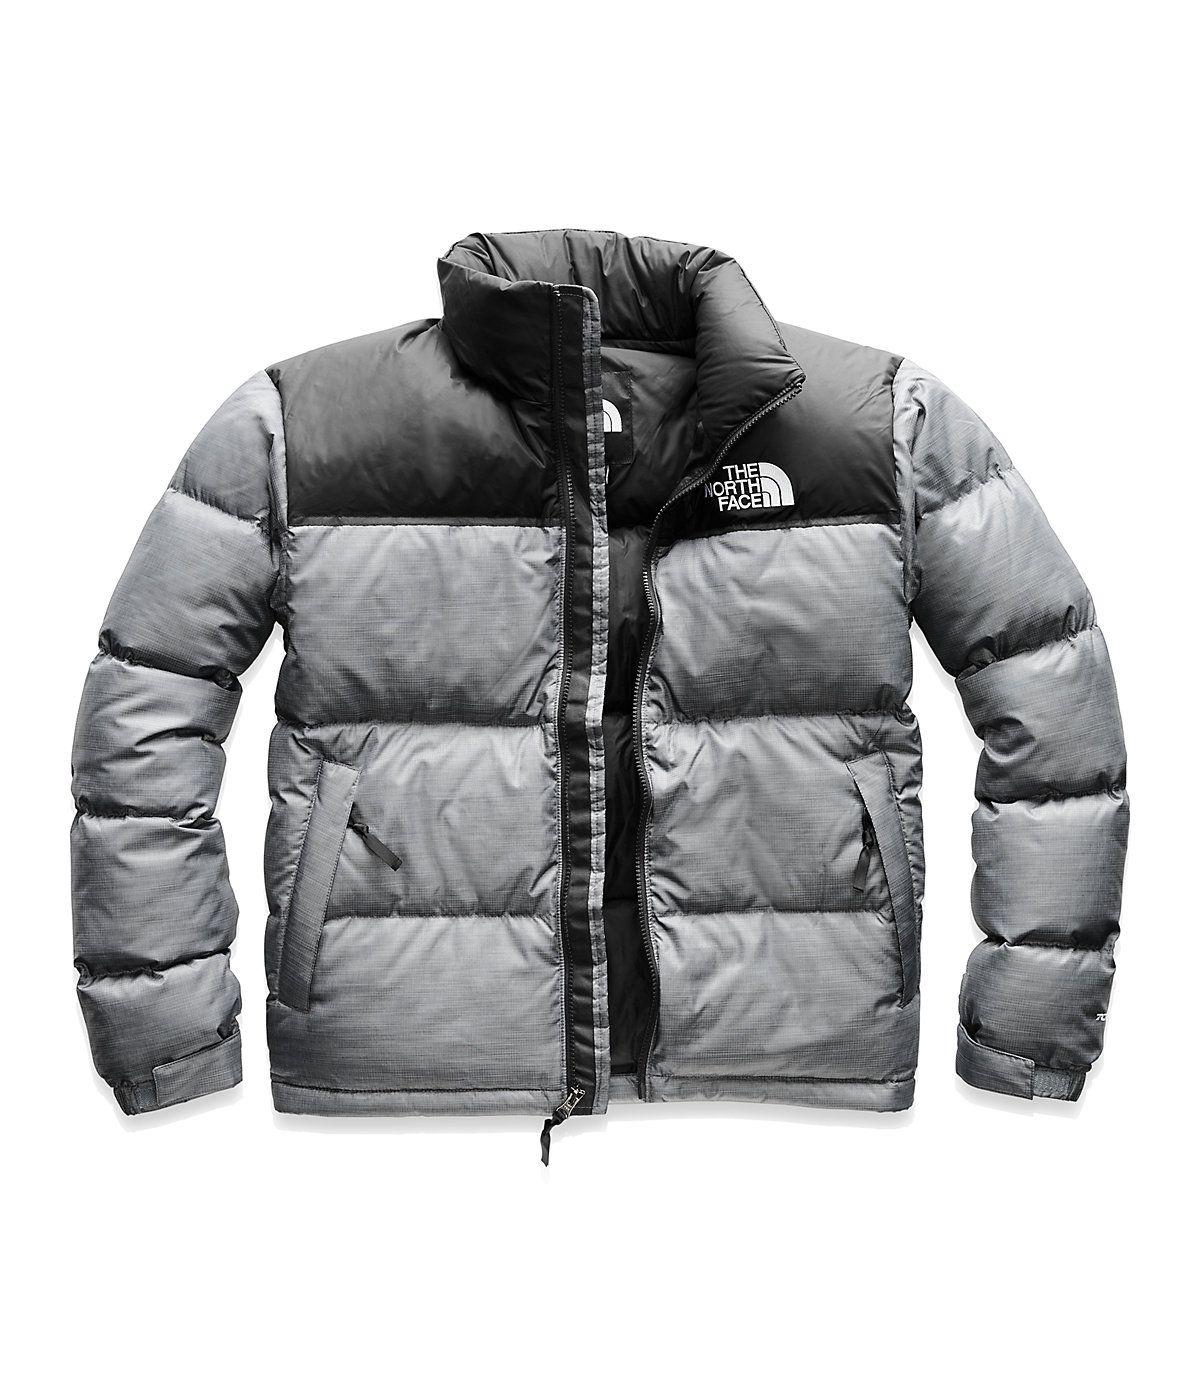 Men S 1996 Retro Nuptse Jacket The North Face North Face Nuptse Jacket Nuptse Jacket Retro Nuptse Jacket [ 1396 x 1200 Pixel ]